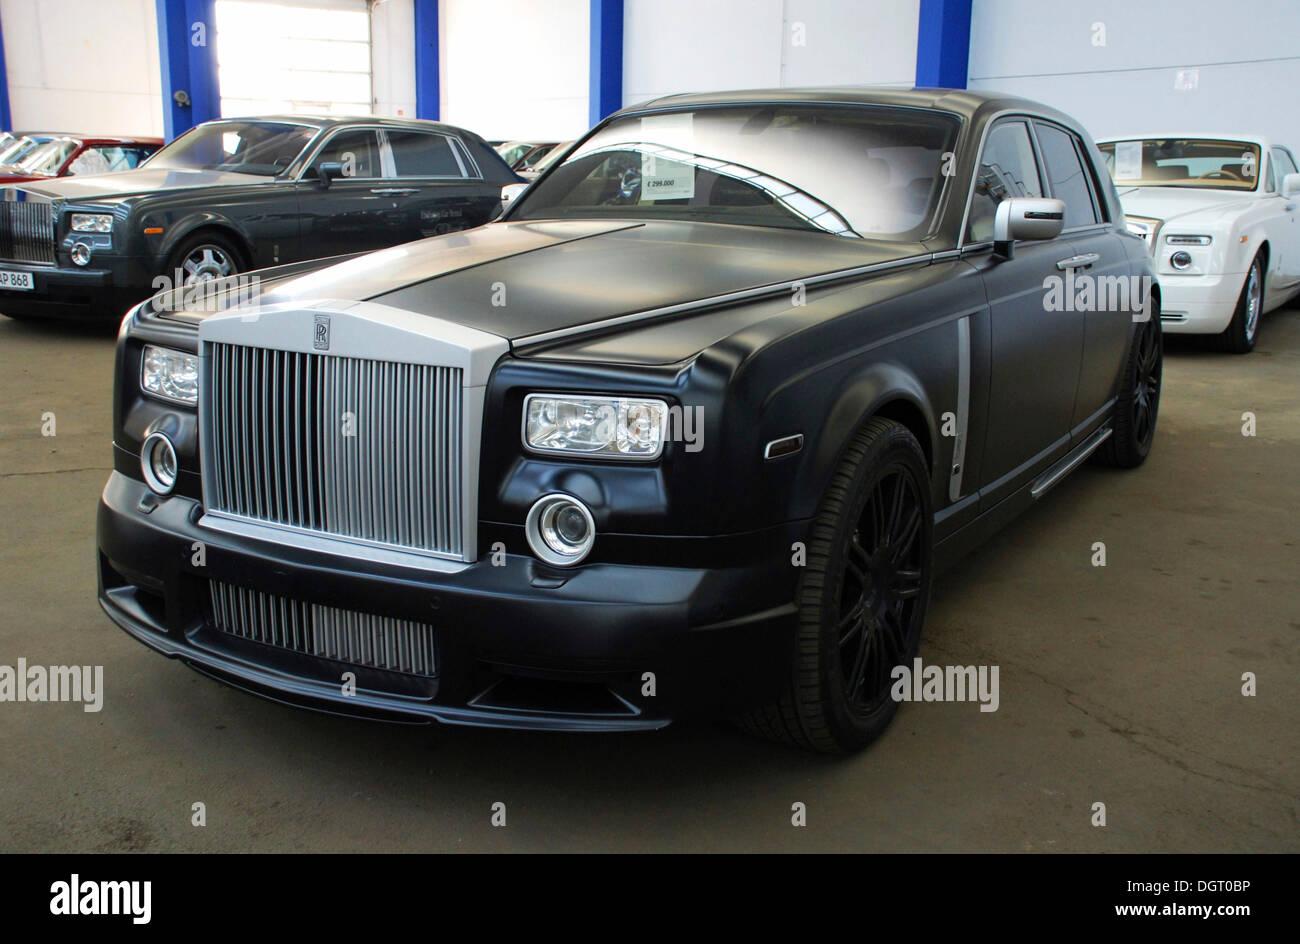 Rolls Royce Phantom Mansory Conquistador Built In 2007 460 Hp For Stock Photo Alamy